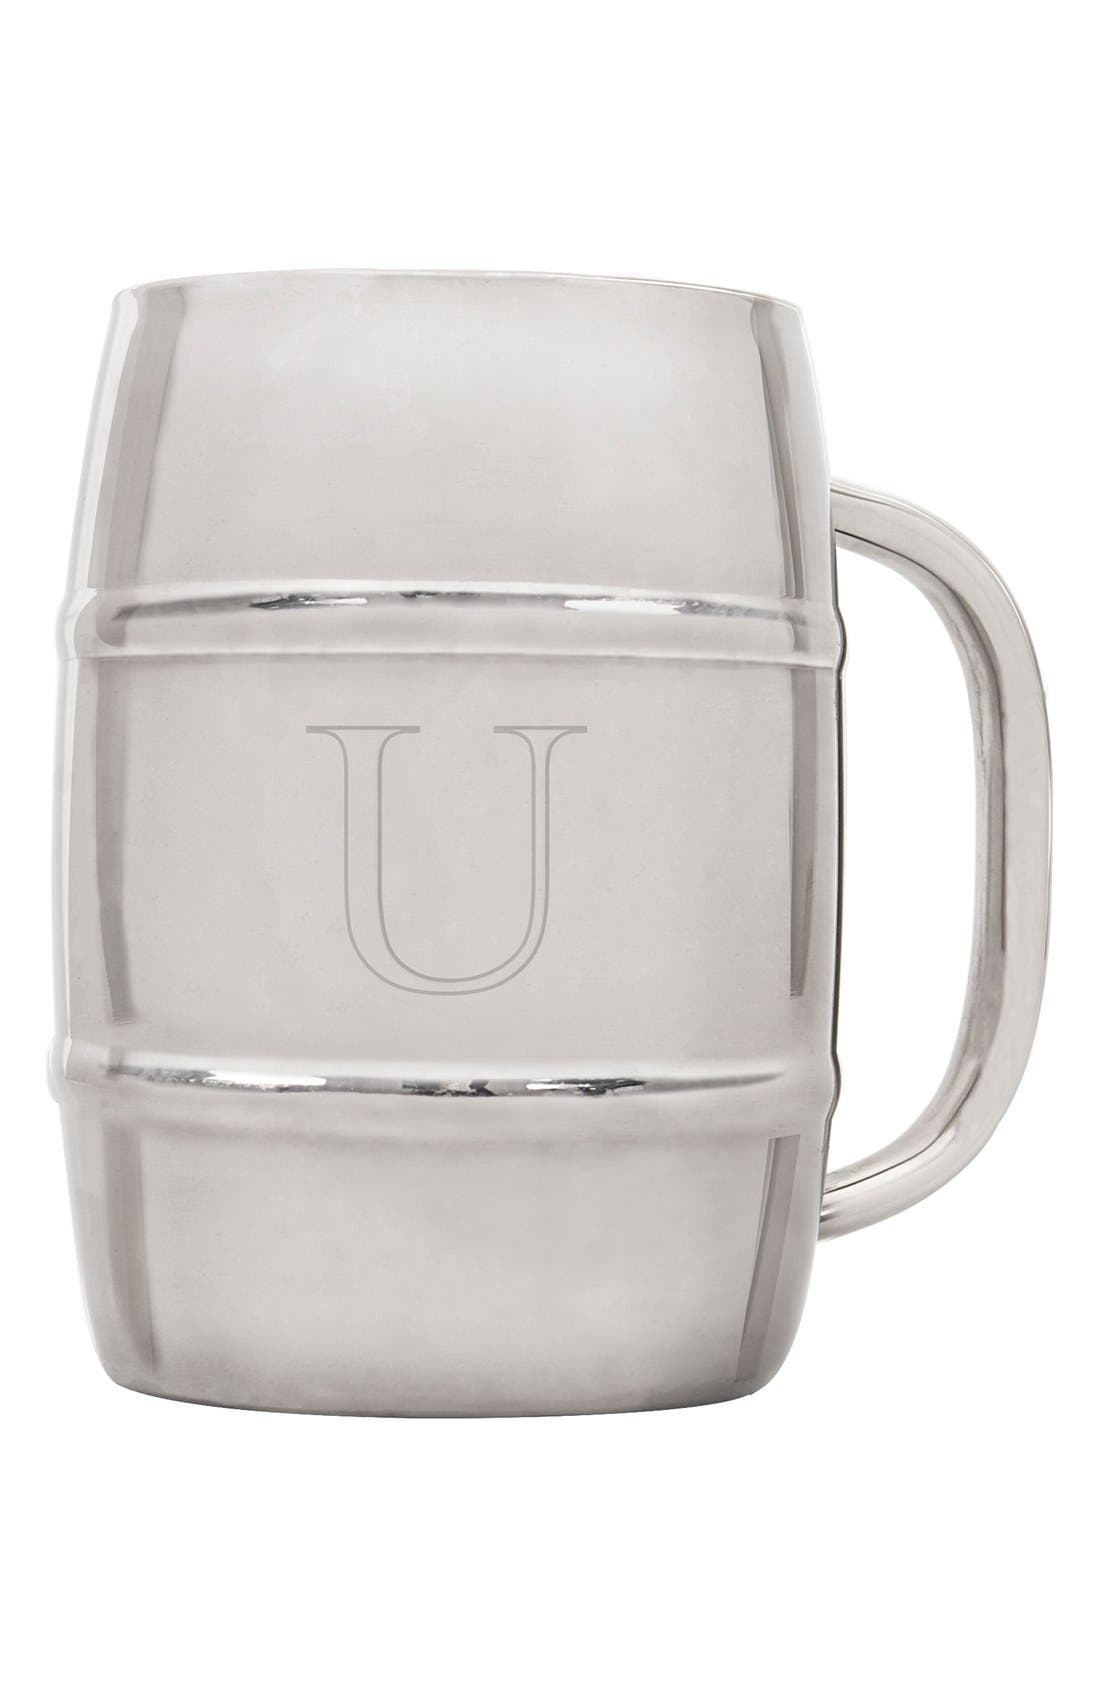 Alternate Image 1 Selected - Cathy's Concepts 'XL Beer Keg' Monogram Mug